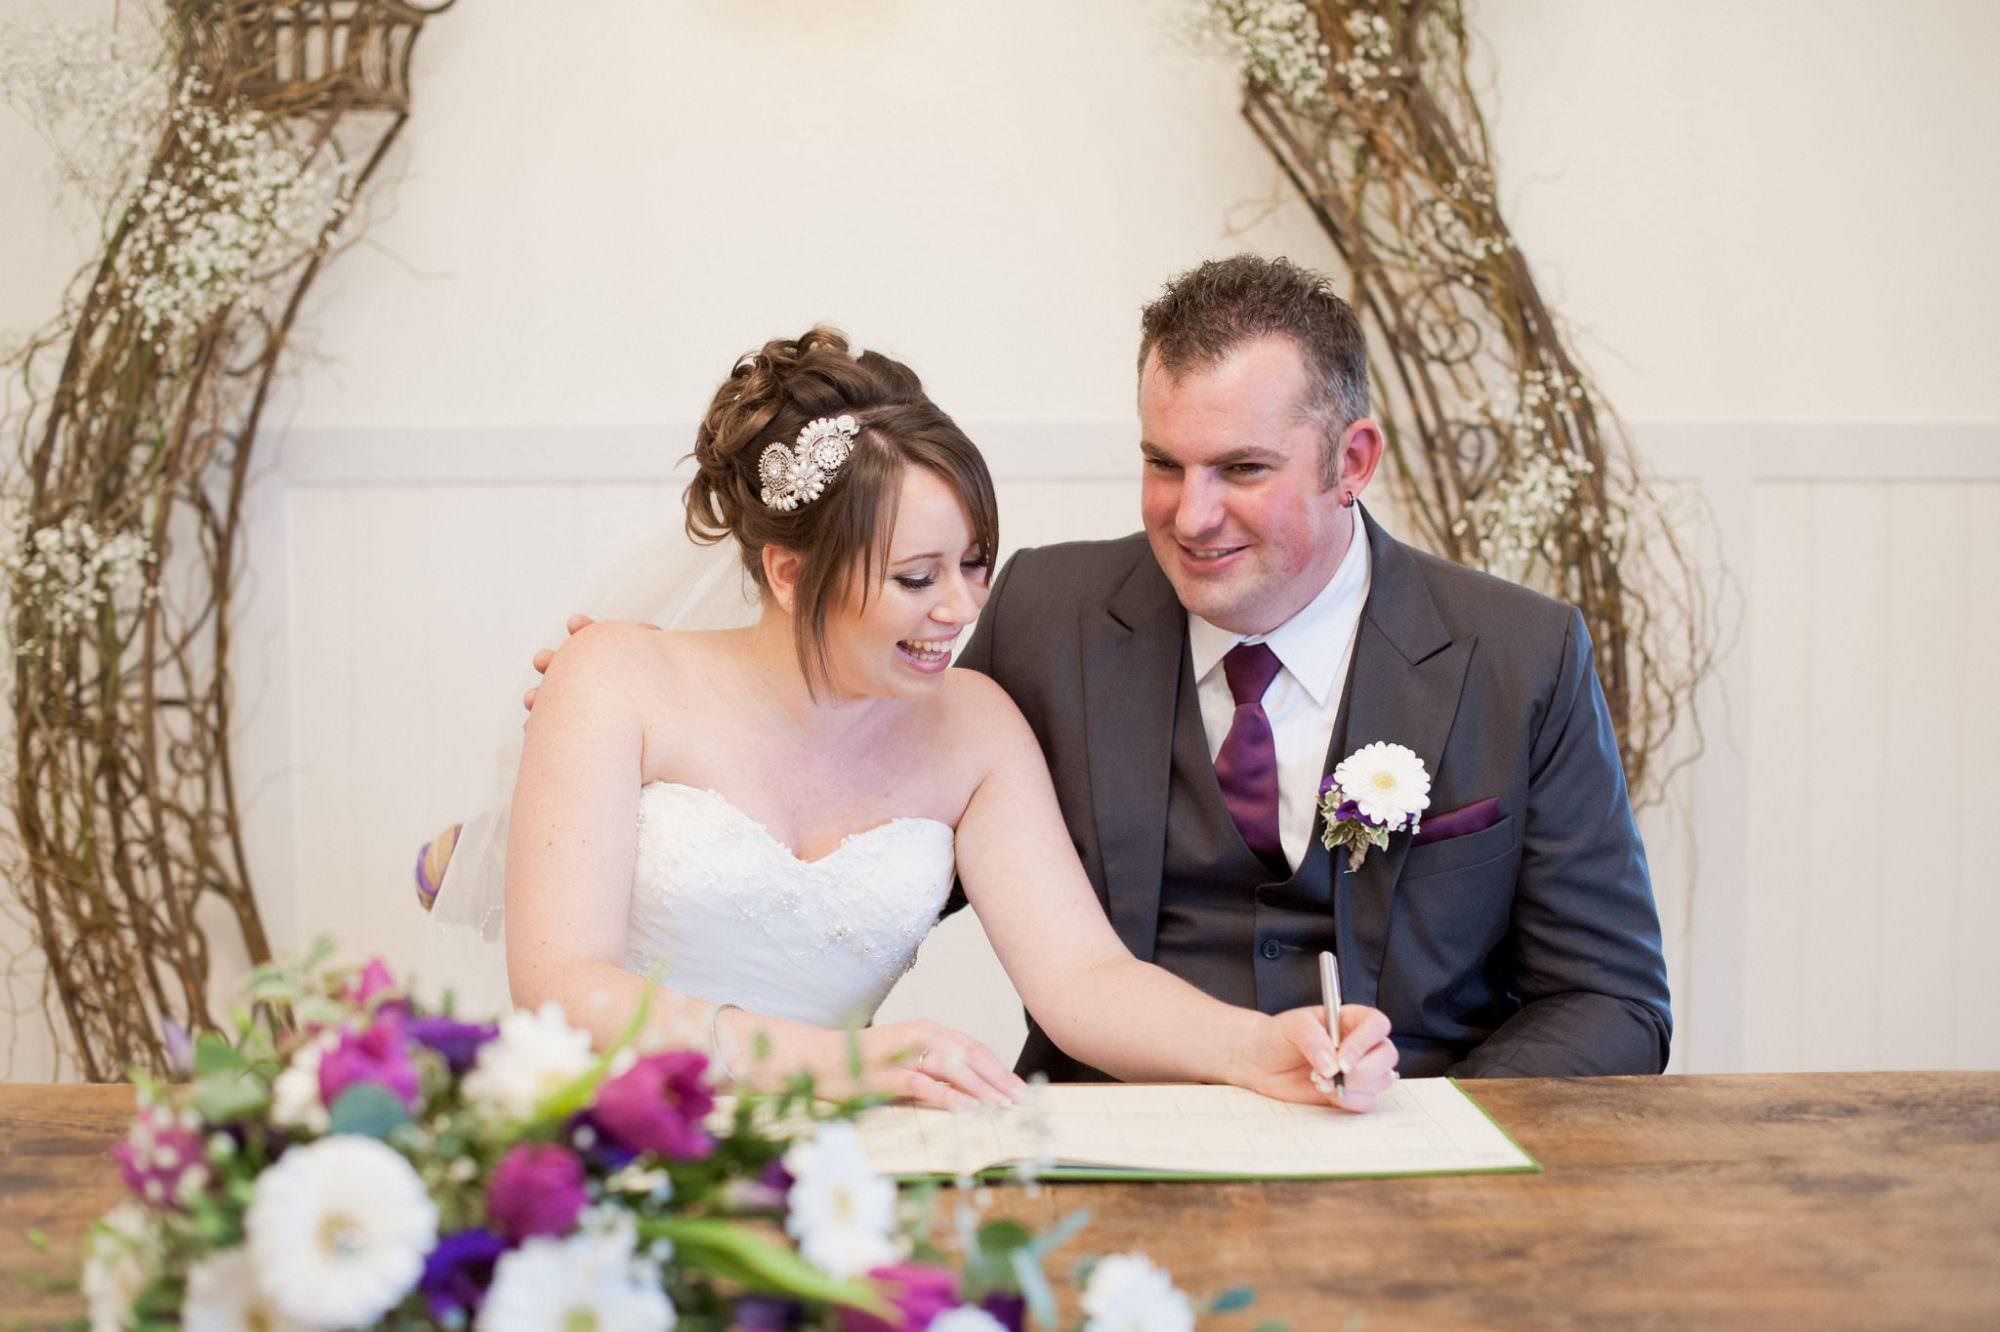 wedding register rachel elizabeth photography wedding